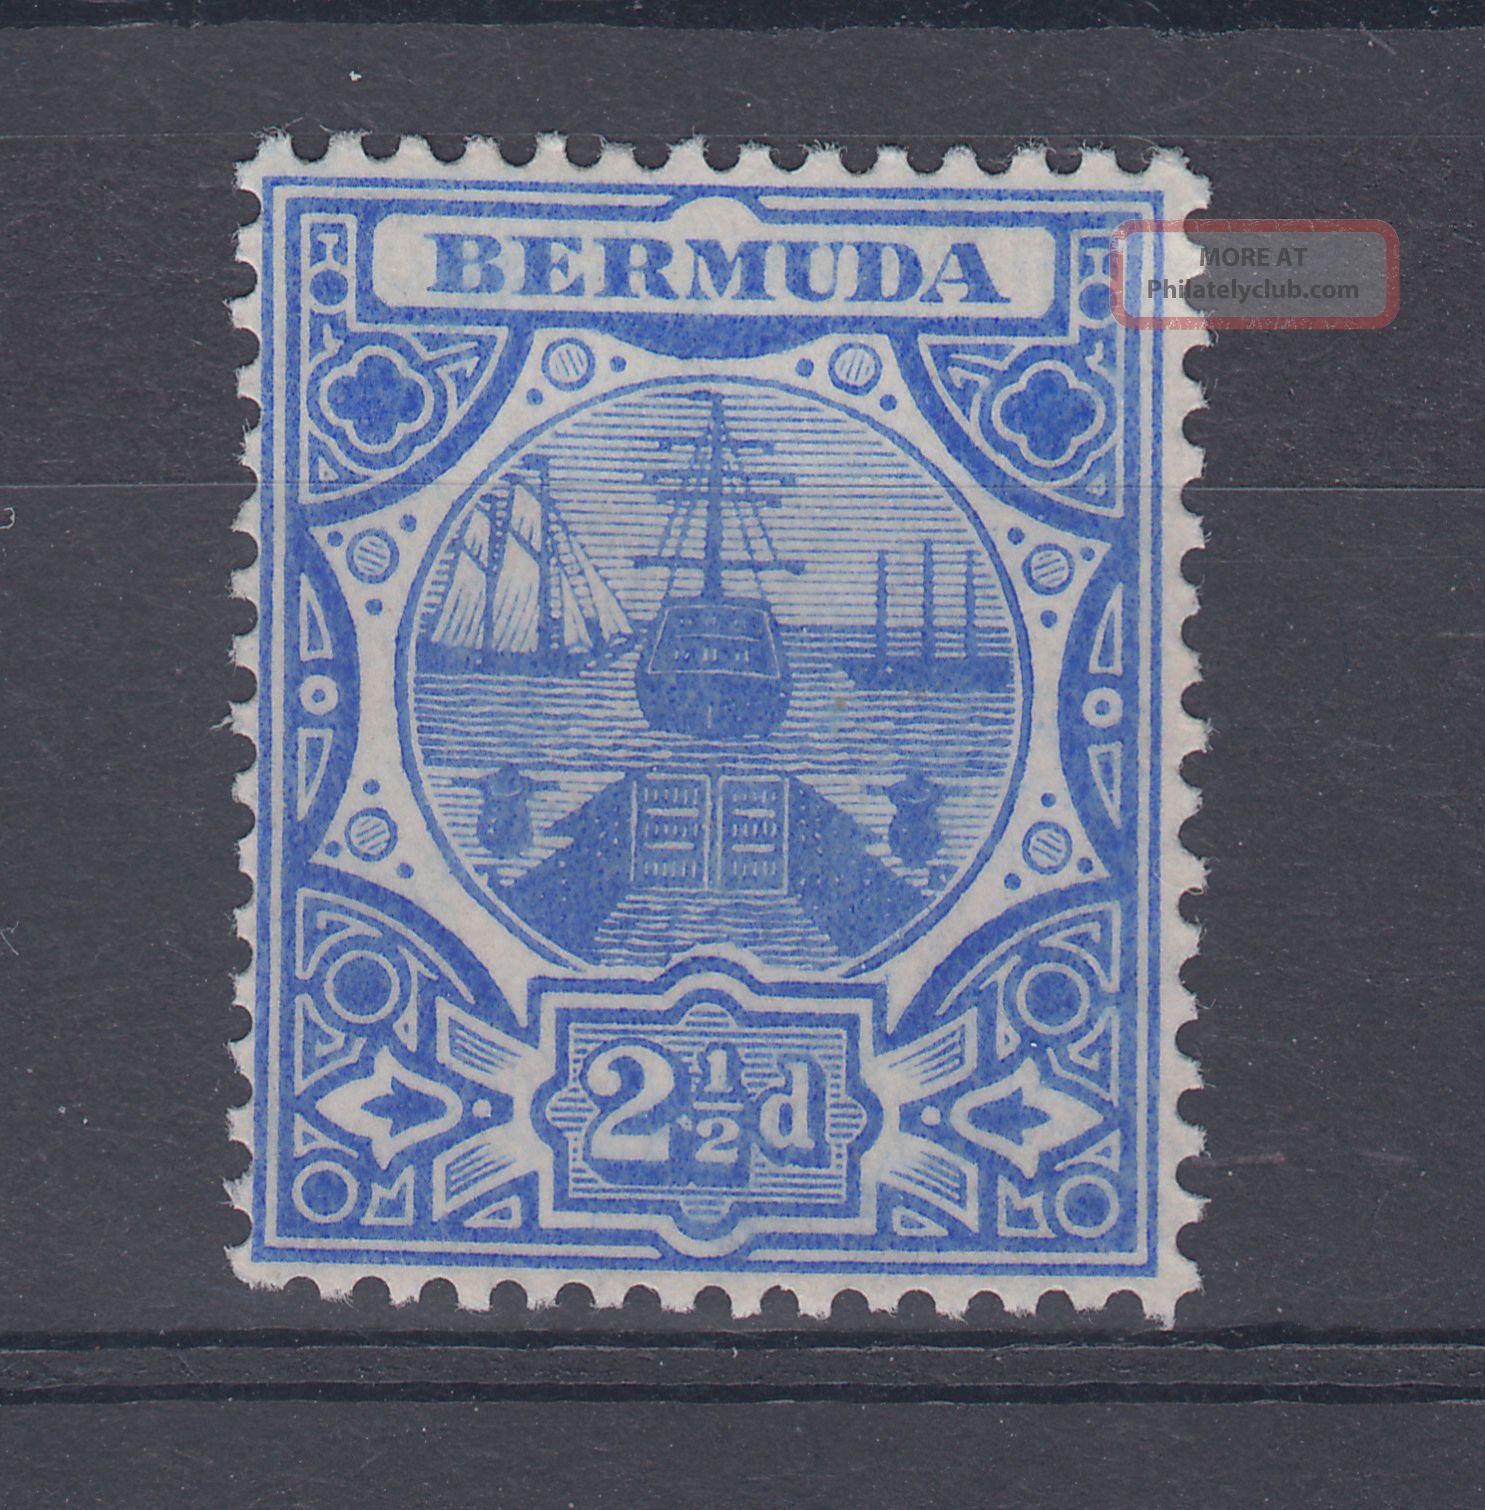 1910 Bermuda M/m Dry Dock 2.  5d Stamp (sg 41) British Colonies & Territories photo